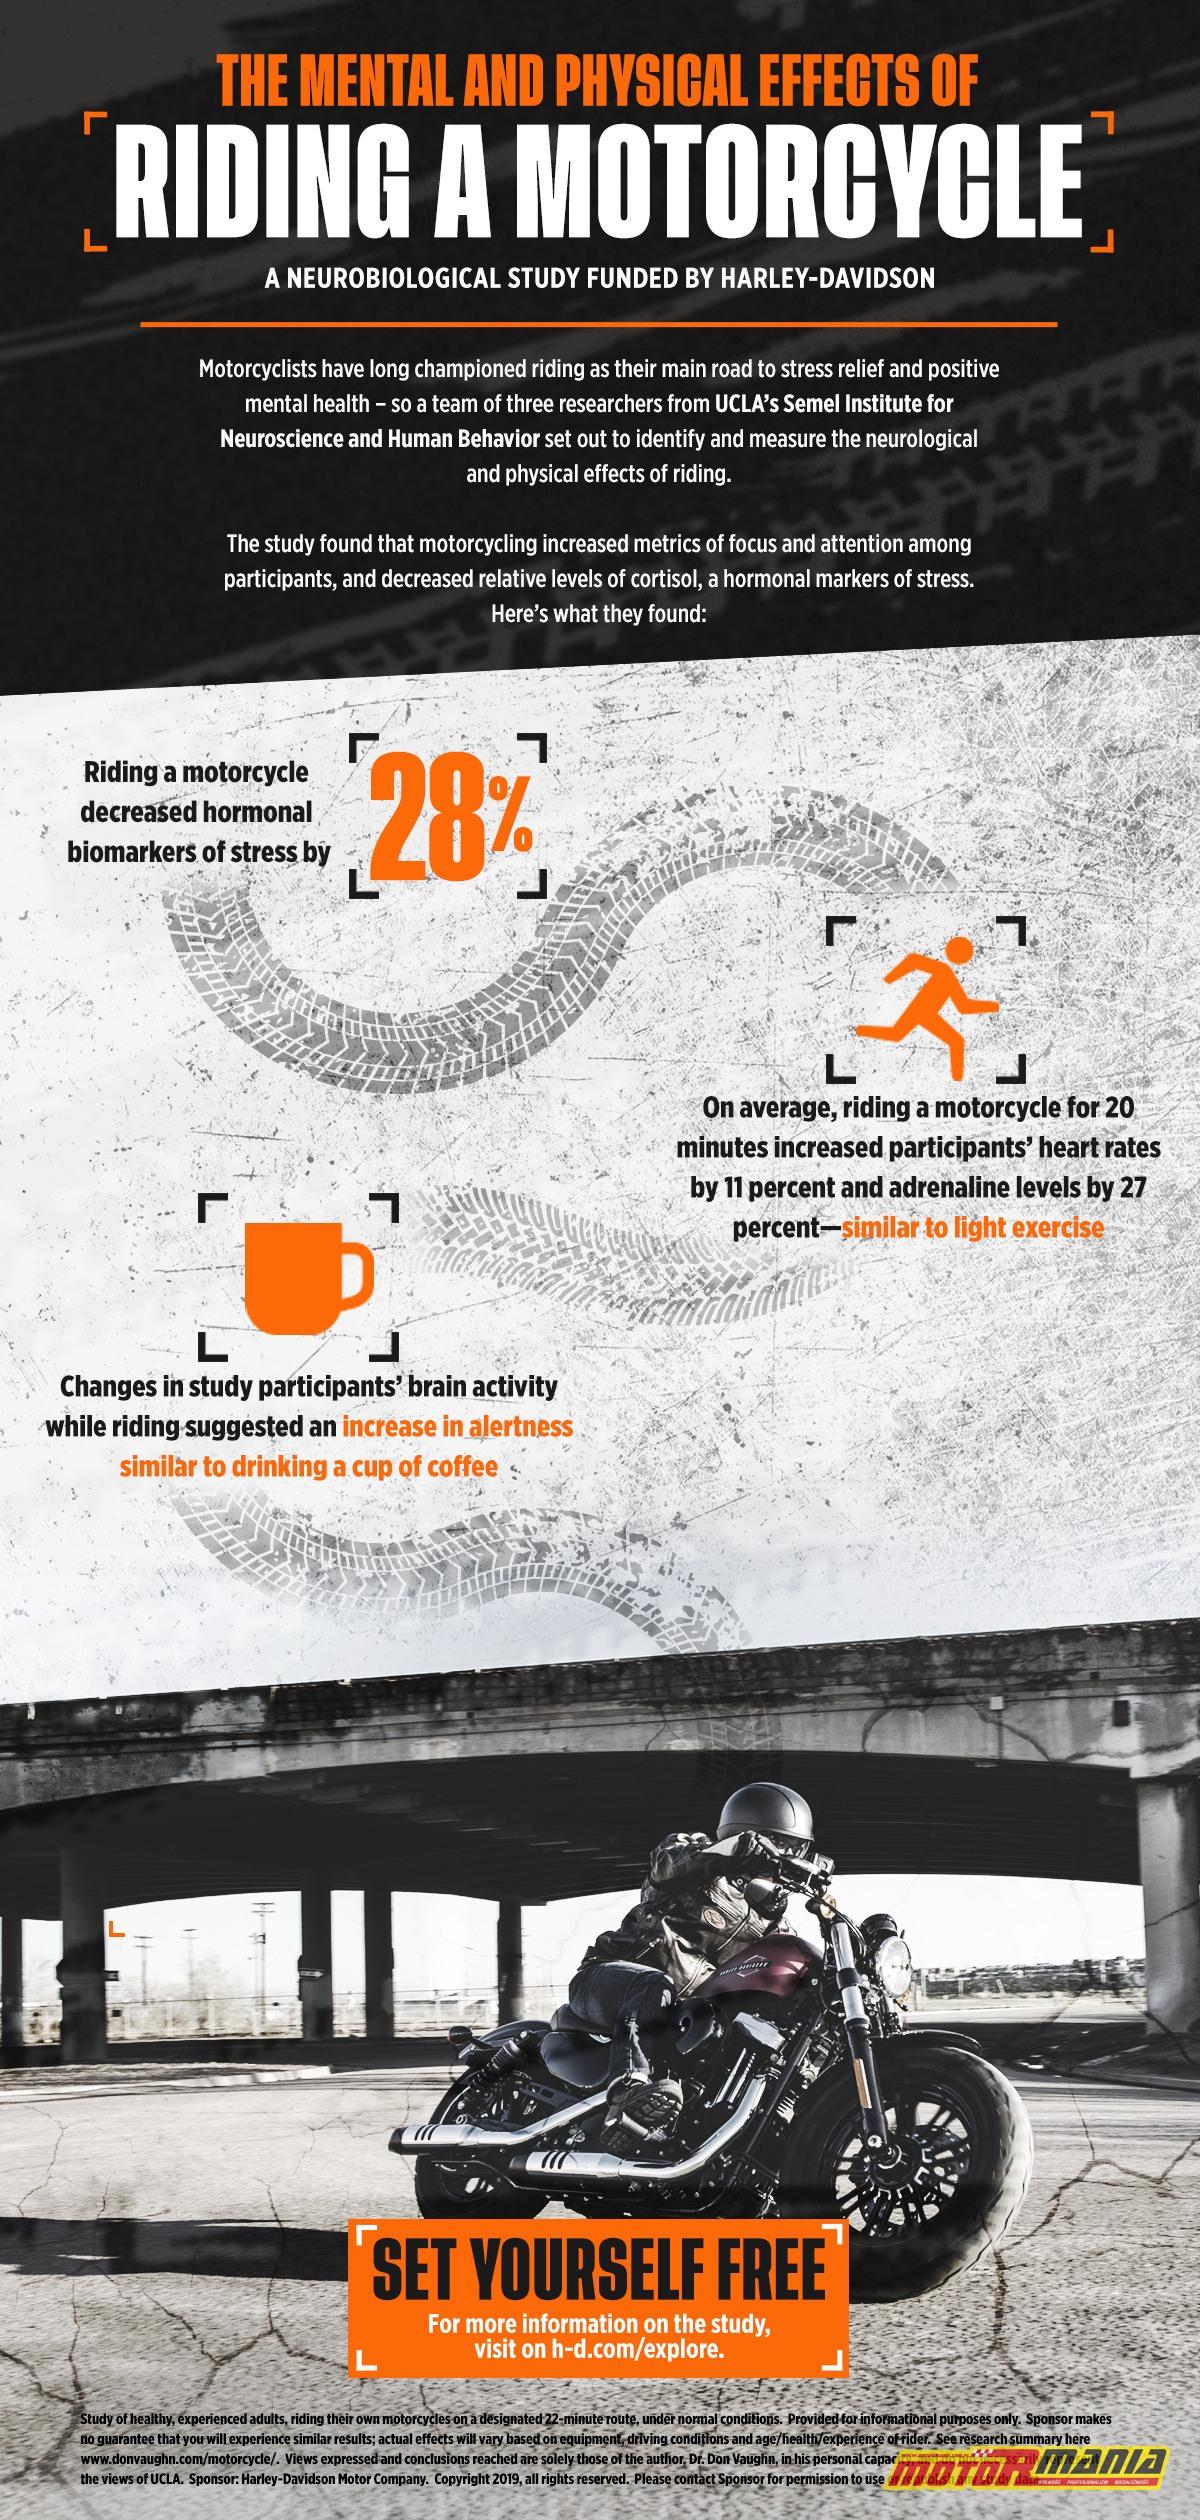 Jazda motocyklem redukuje stres (6) infografika